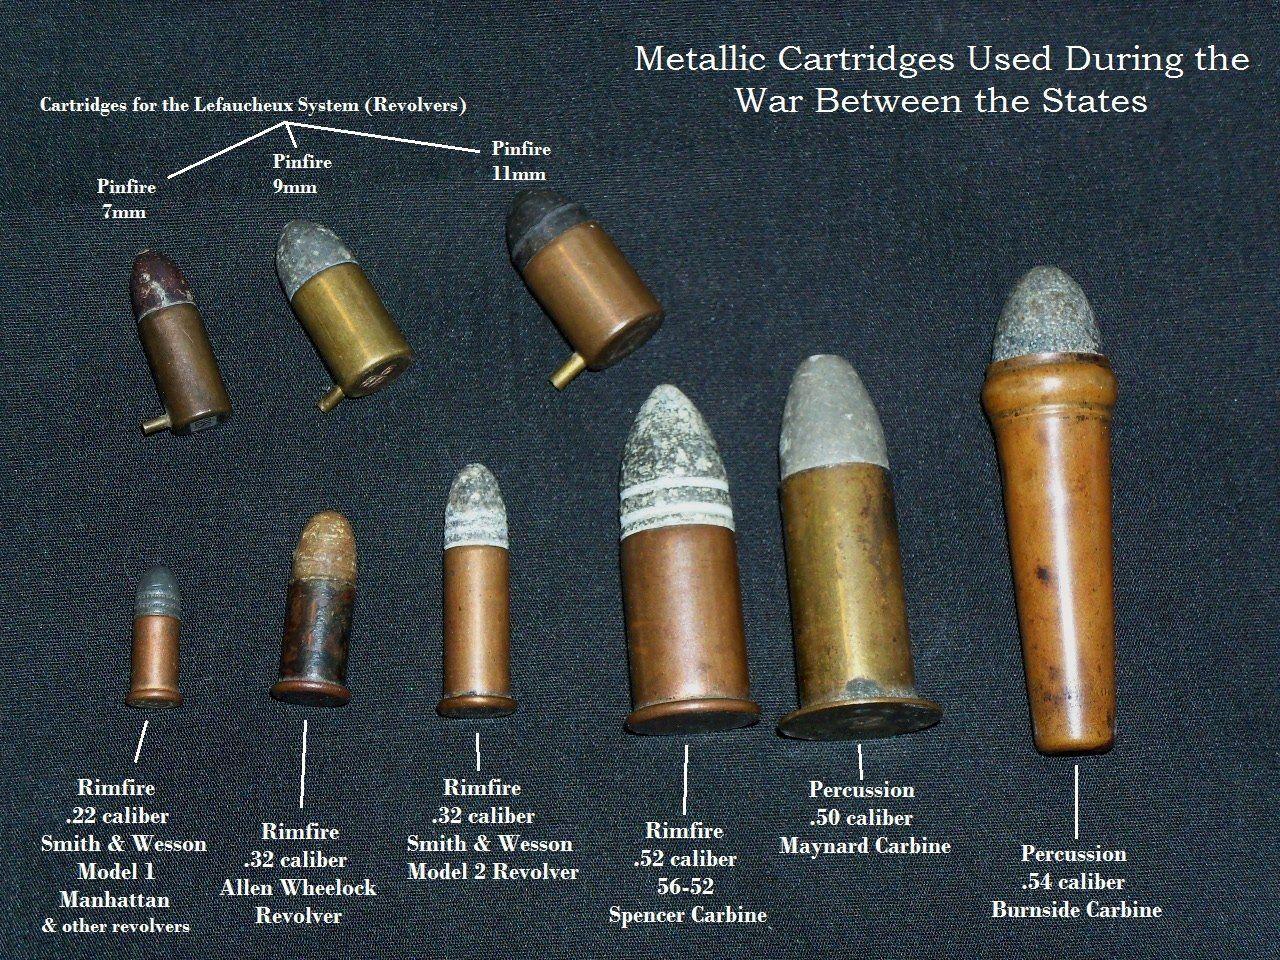 300 weapons and strategies Non-strategic: 0 warheads surge: 300 warheads (bombs) alert rate assump ons  icbms: minuteman iii (98%) ssbns: 5 on hard alert (each.